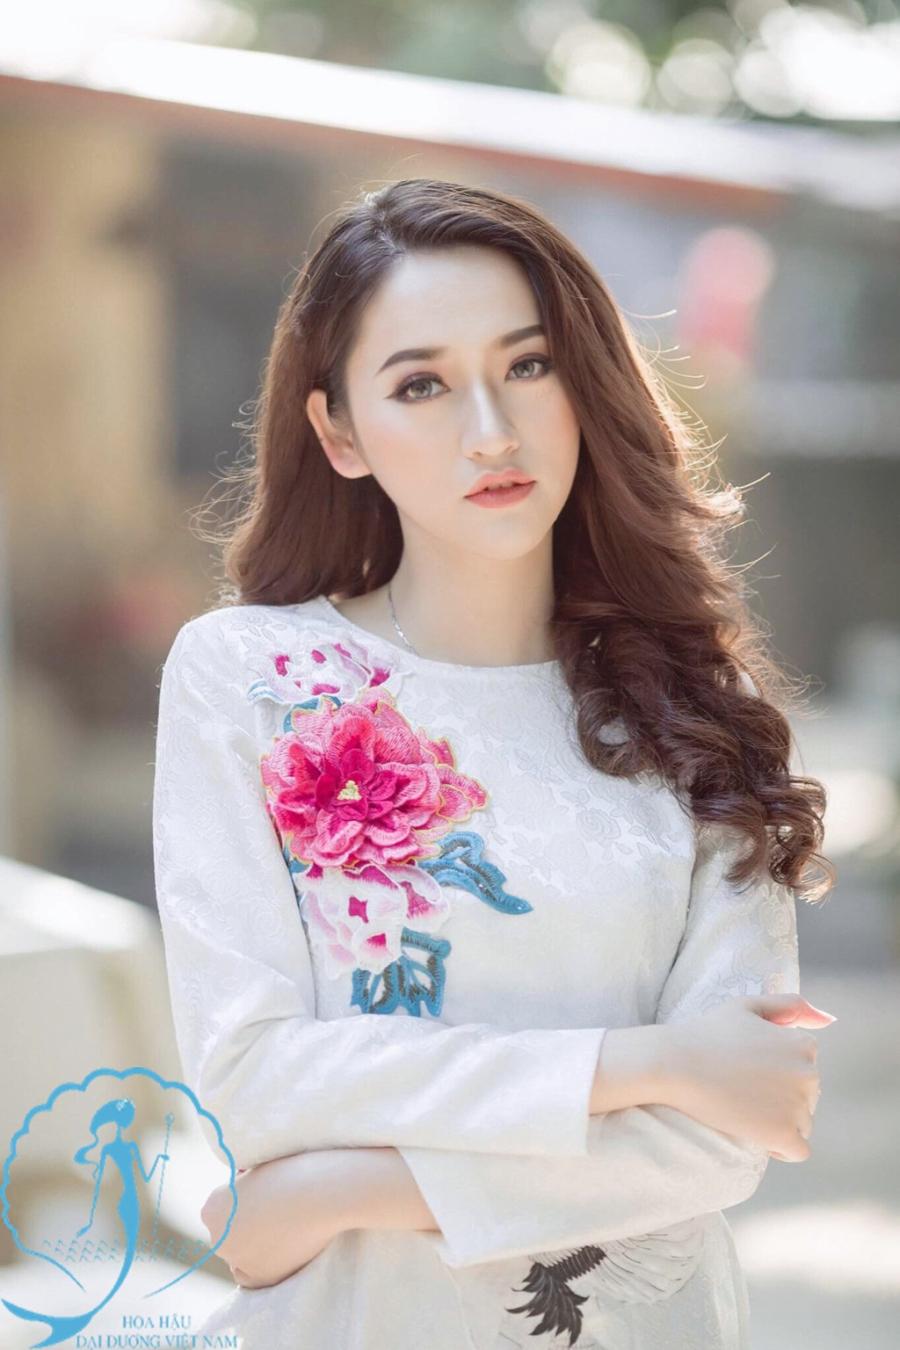 Nhan sac top 10 thi sinh vong online cuoc thi Hoa hau Dai duong 2017 hinh anh 7